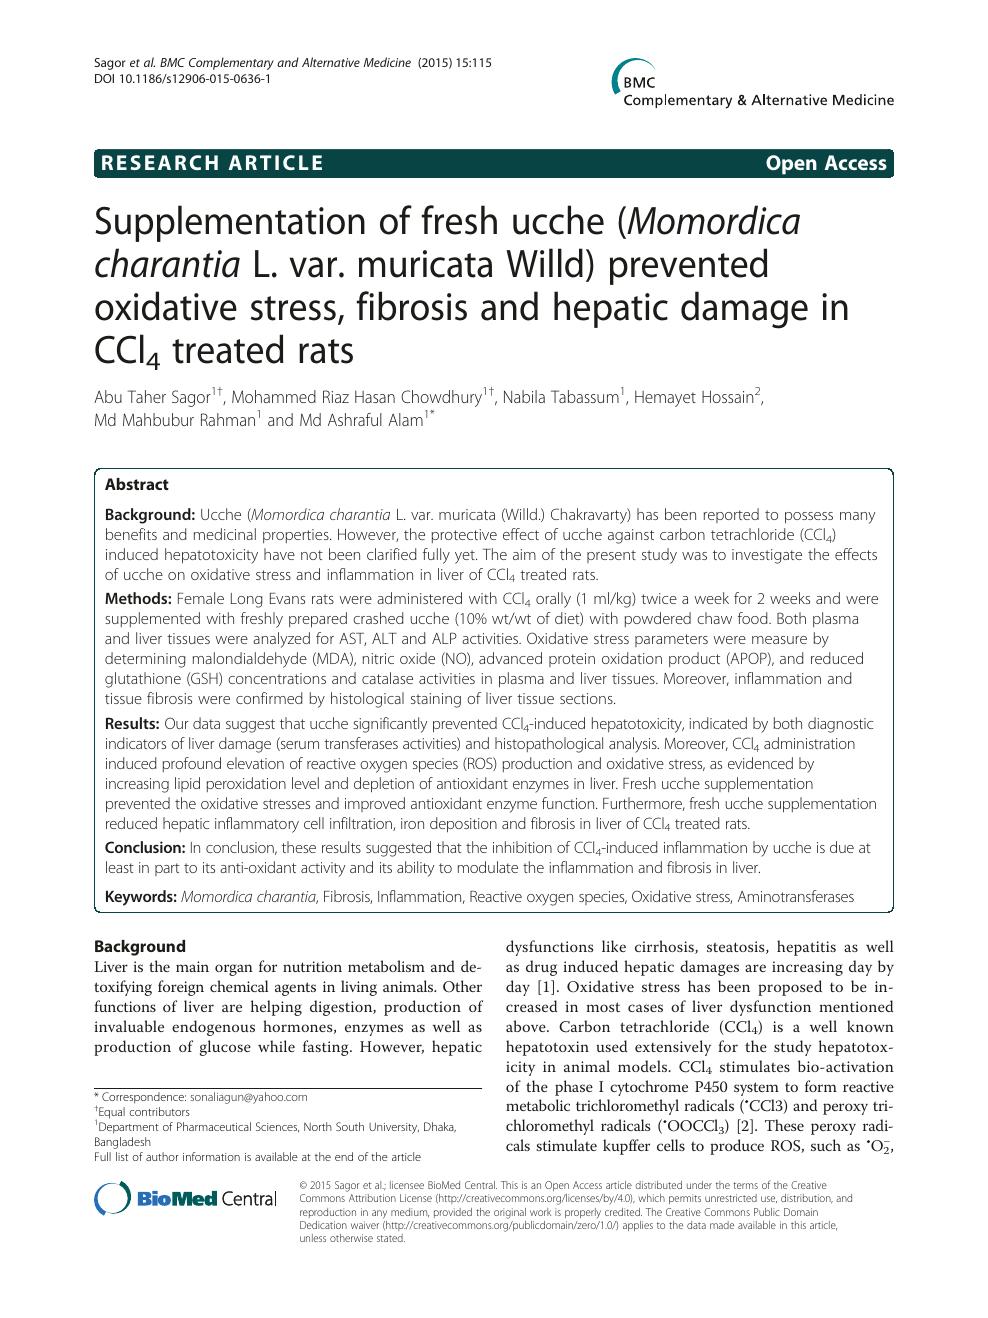 Supplementation of fresh ucche (Momordica charantia L  var